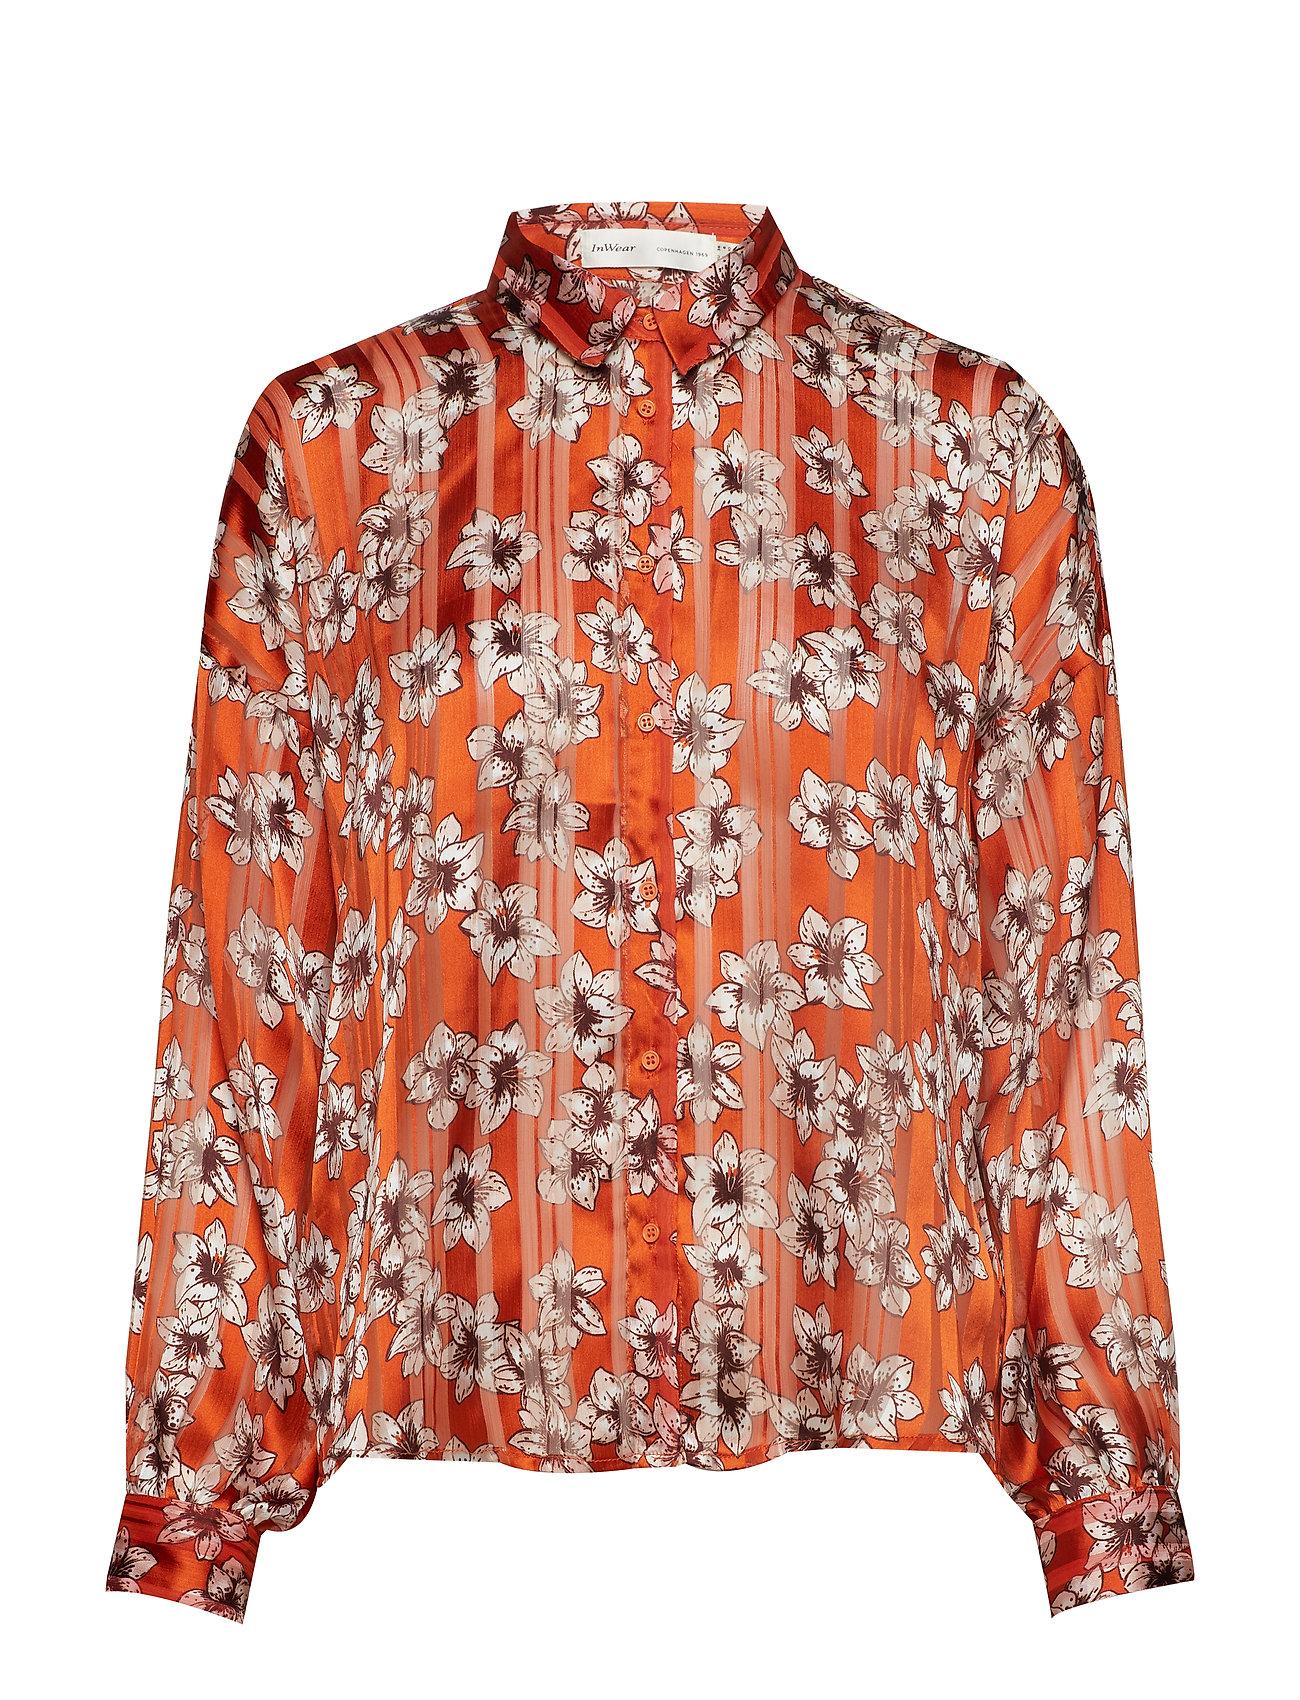 InWear ZilmaIW Hilma Shirt - GOLD FLAME HIBISCUS FLOWER